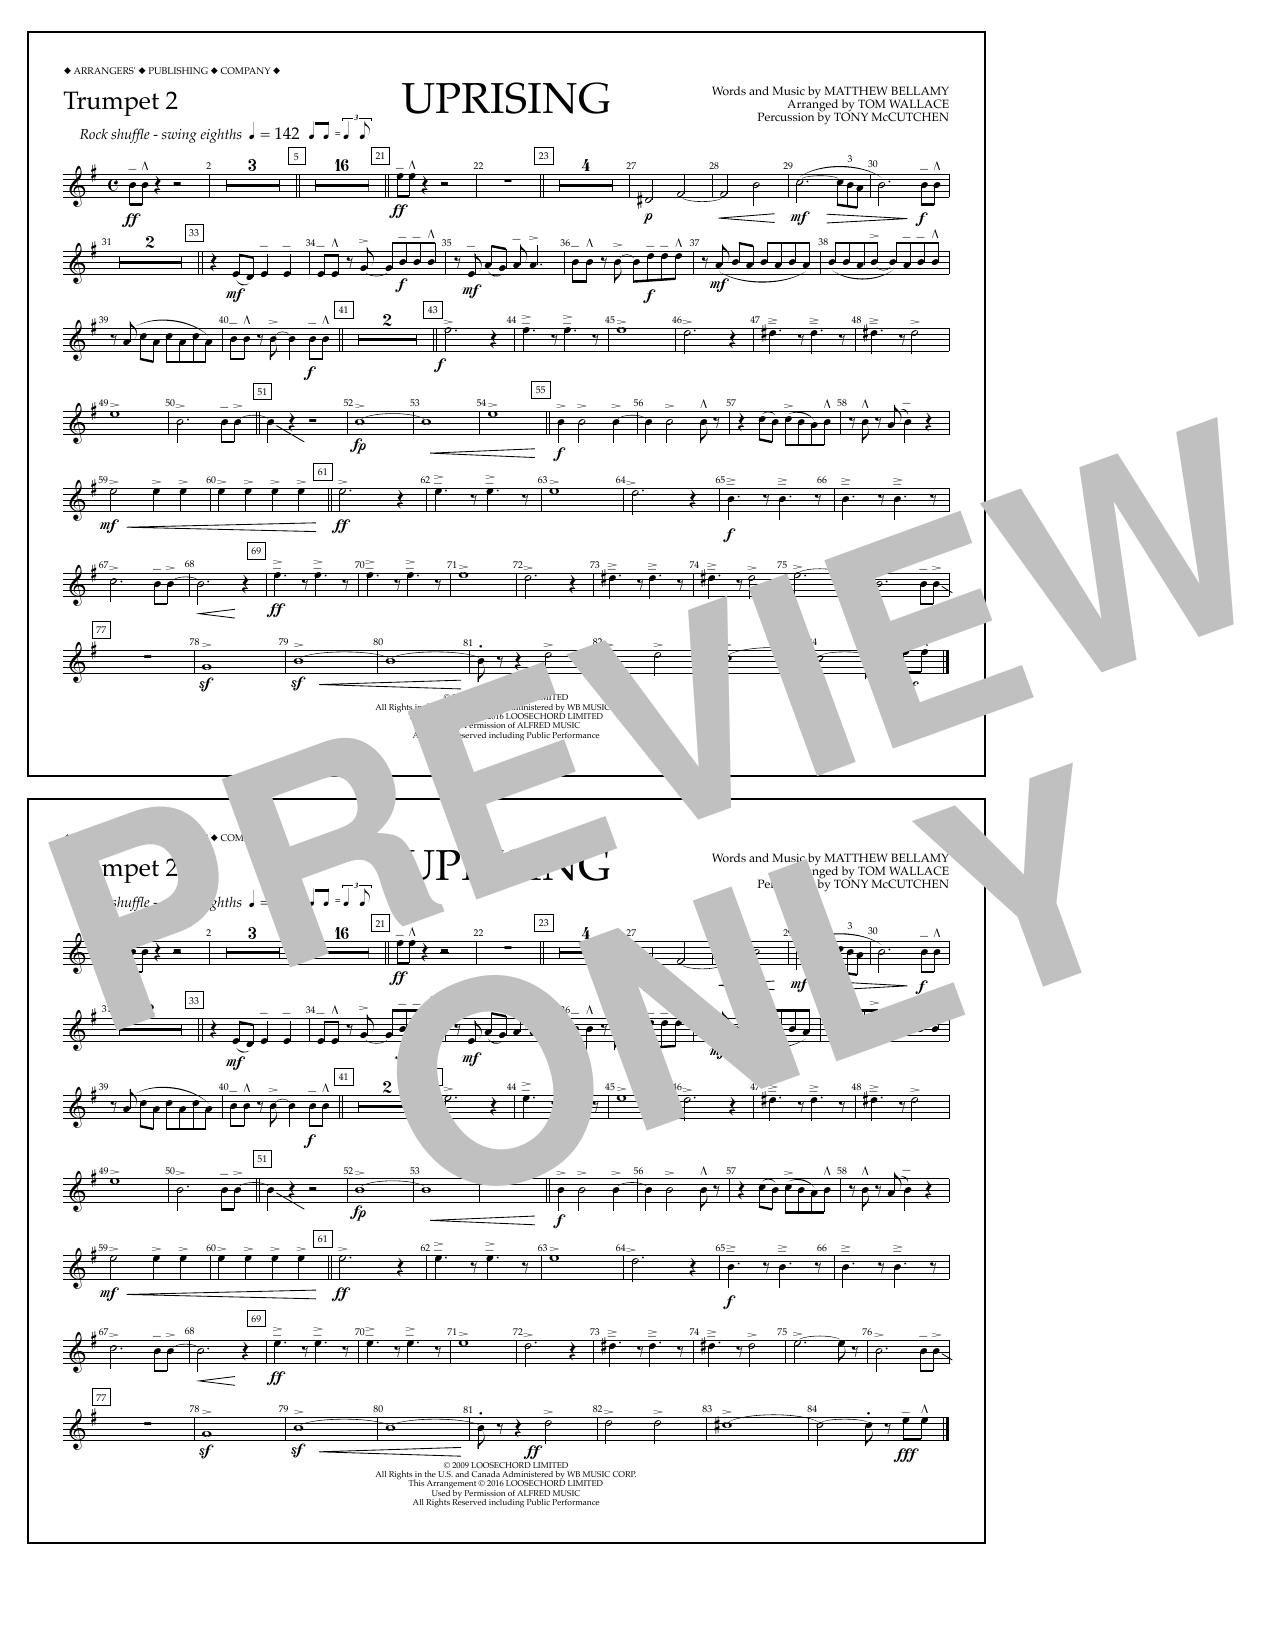 Muse - Uprising - Trumpet 2